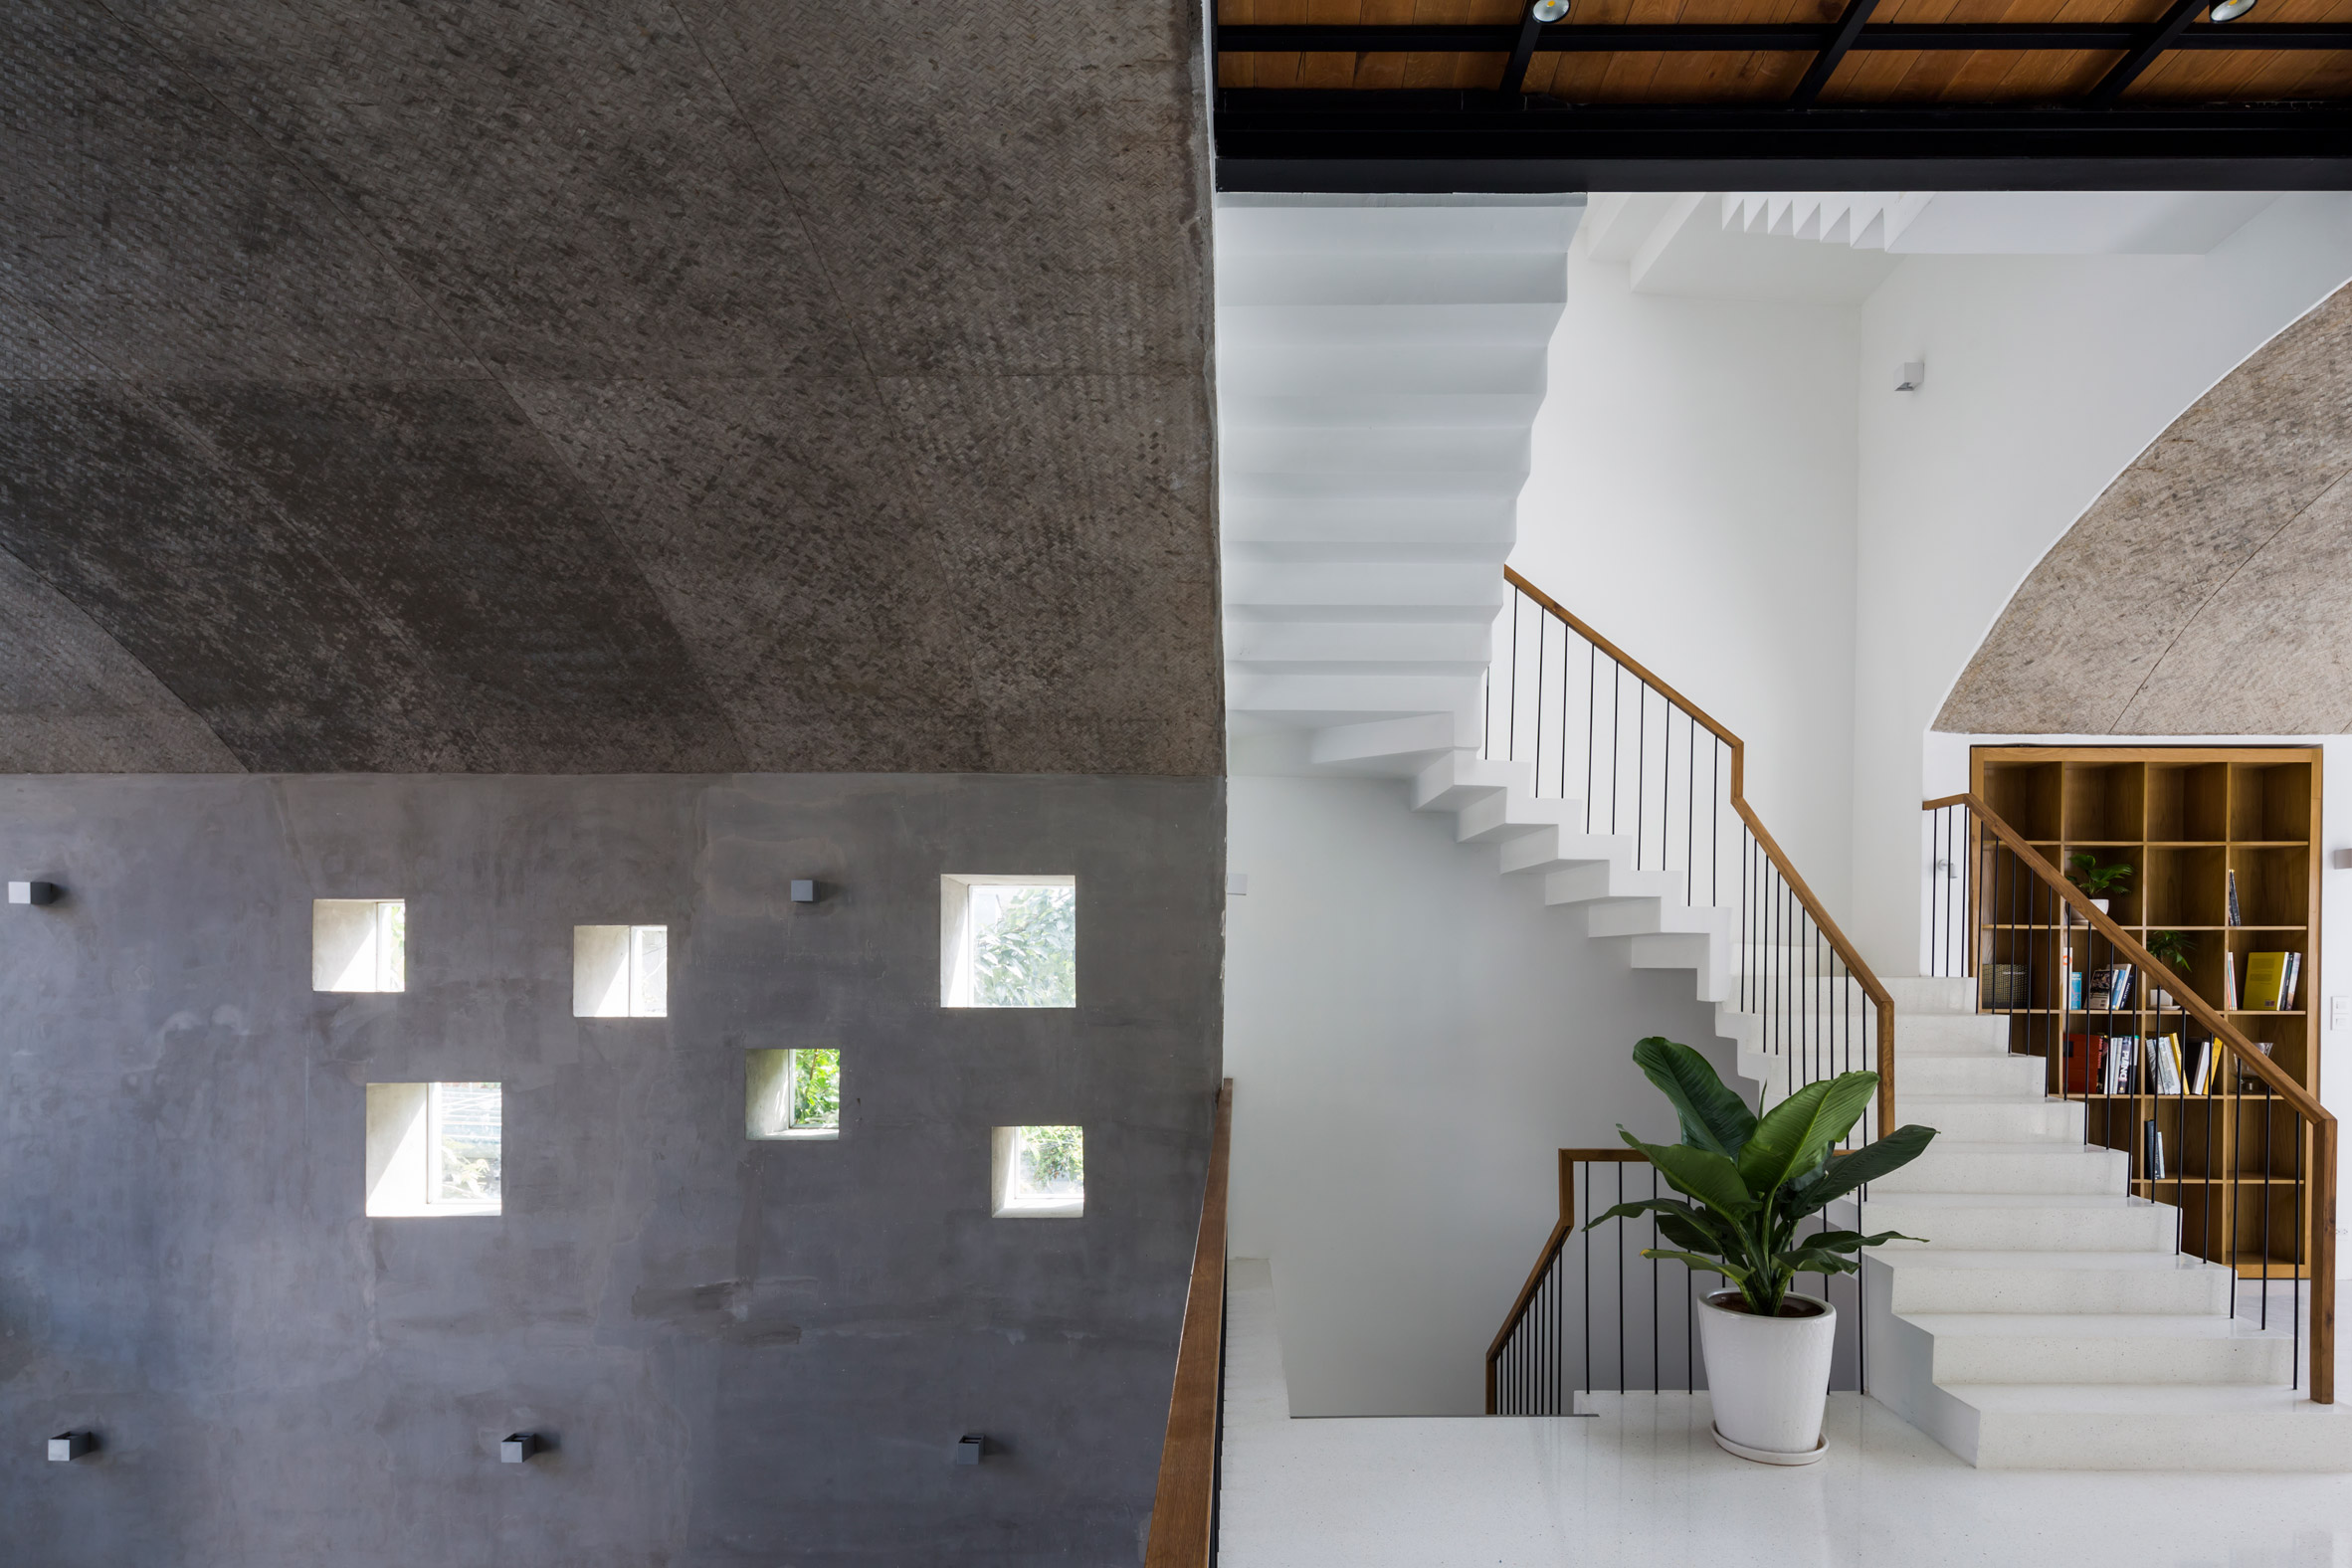 Interiors of Vom House in Vietnam by Sanuki Daisuke Architects